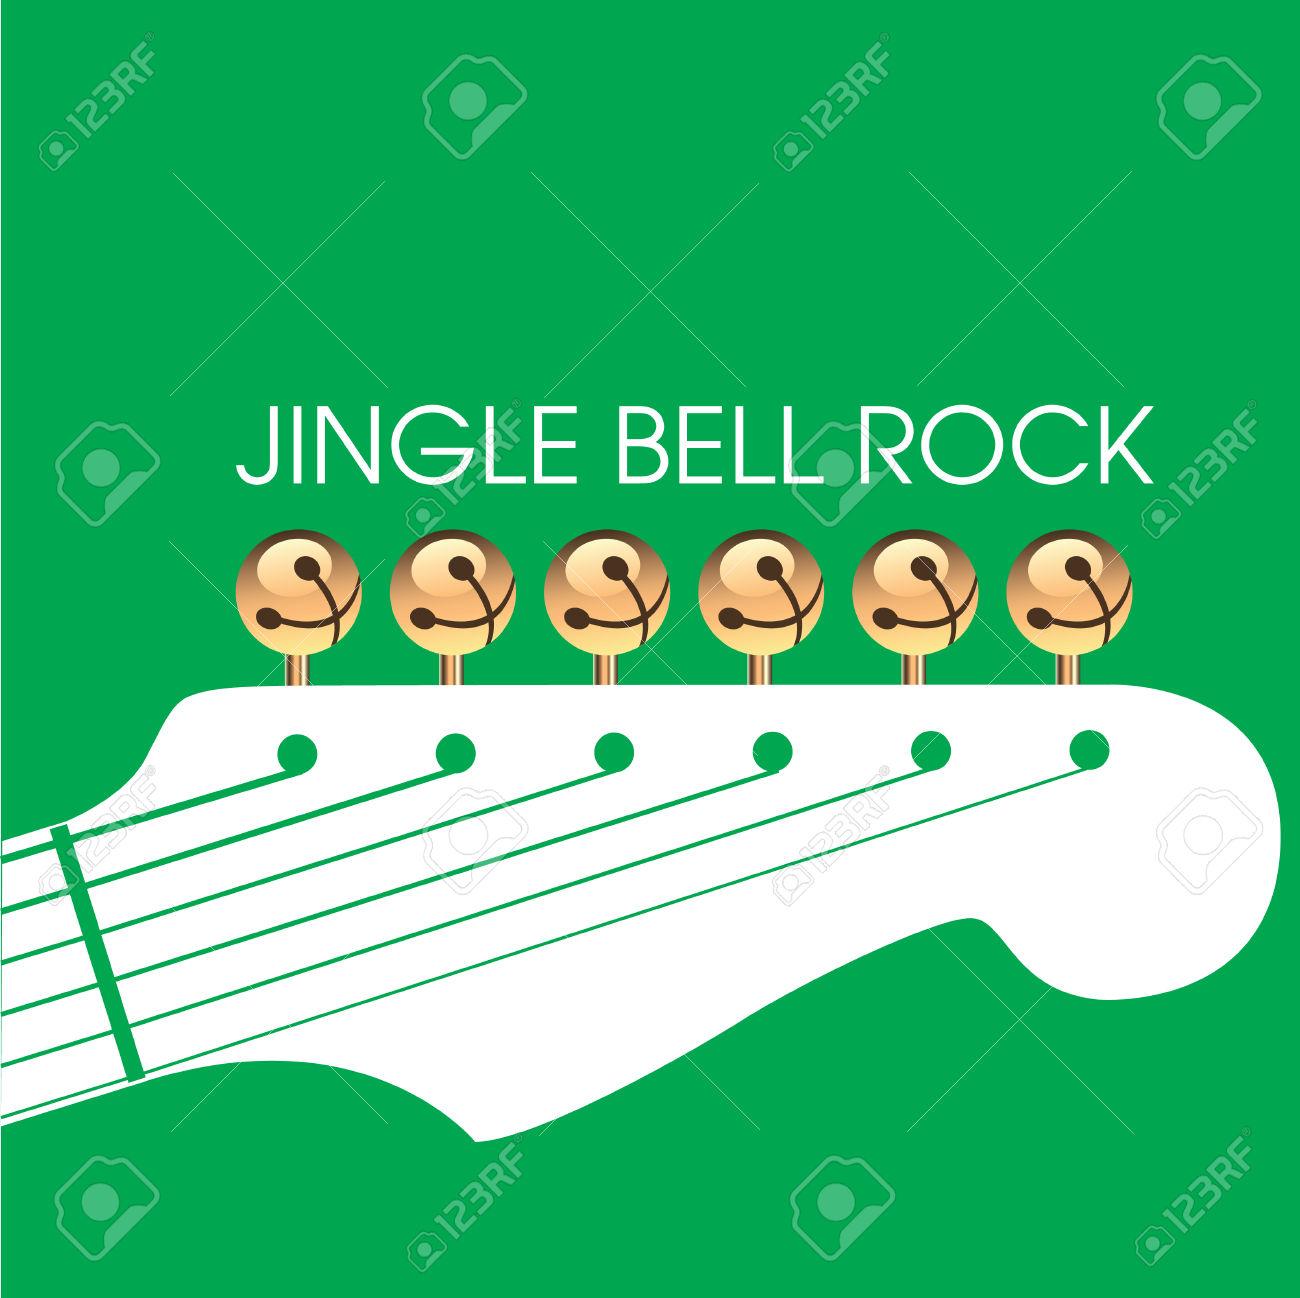 66 Jingling Stock Vector Illustration And Royalty Free Jingling.